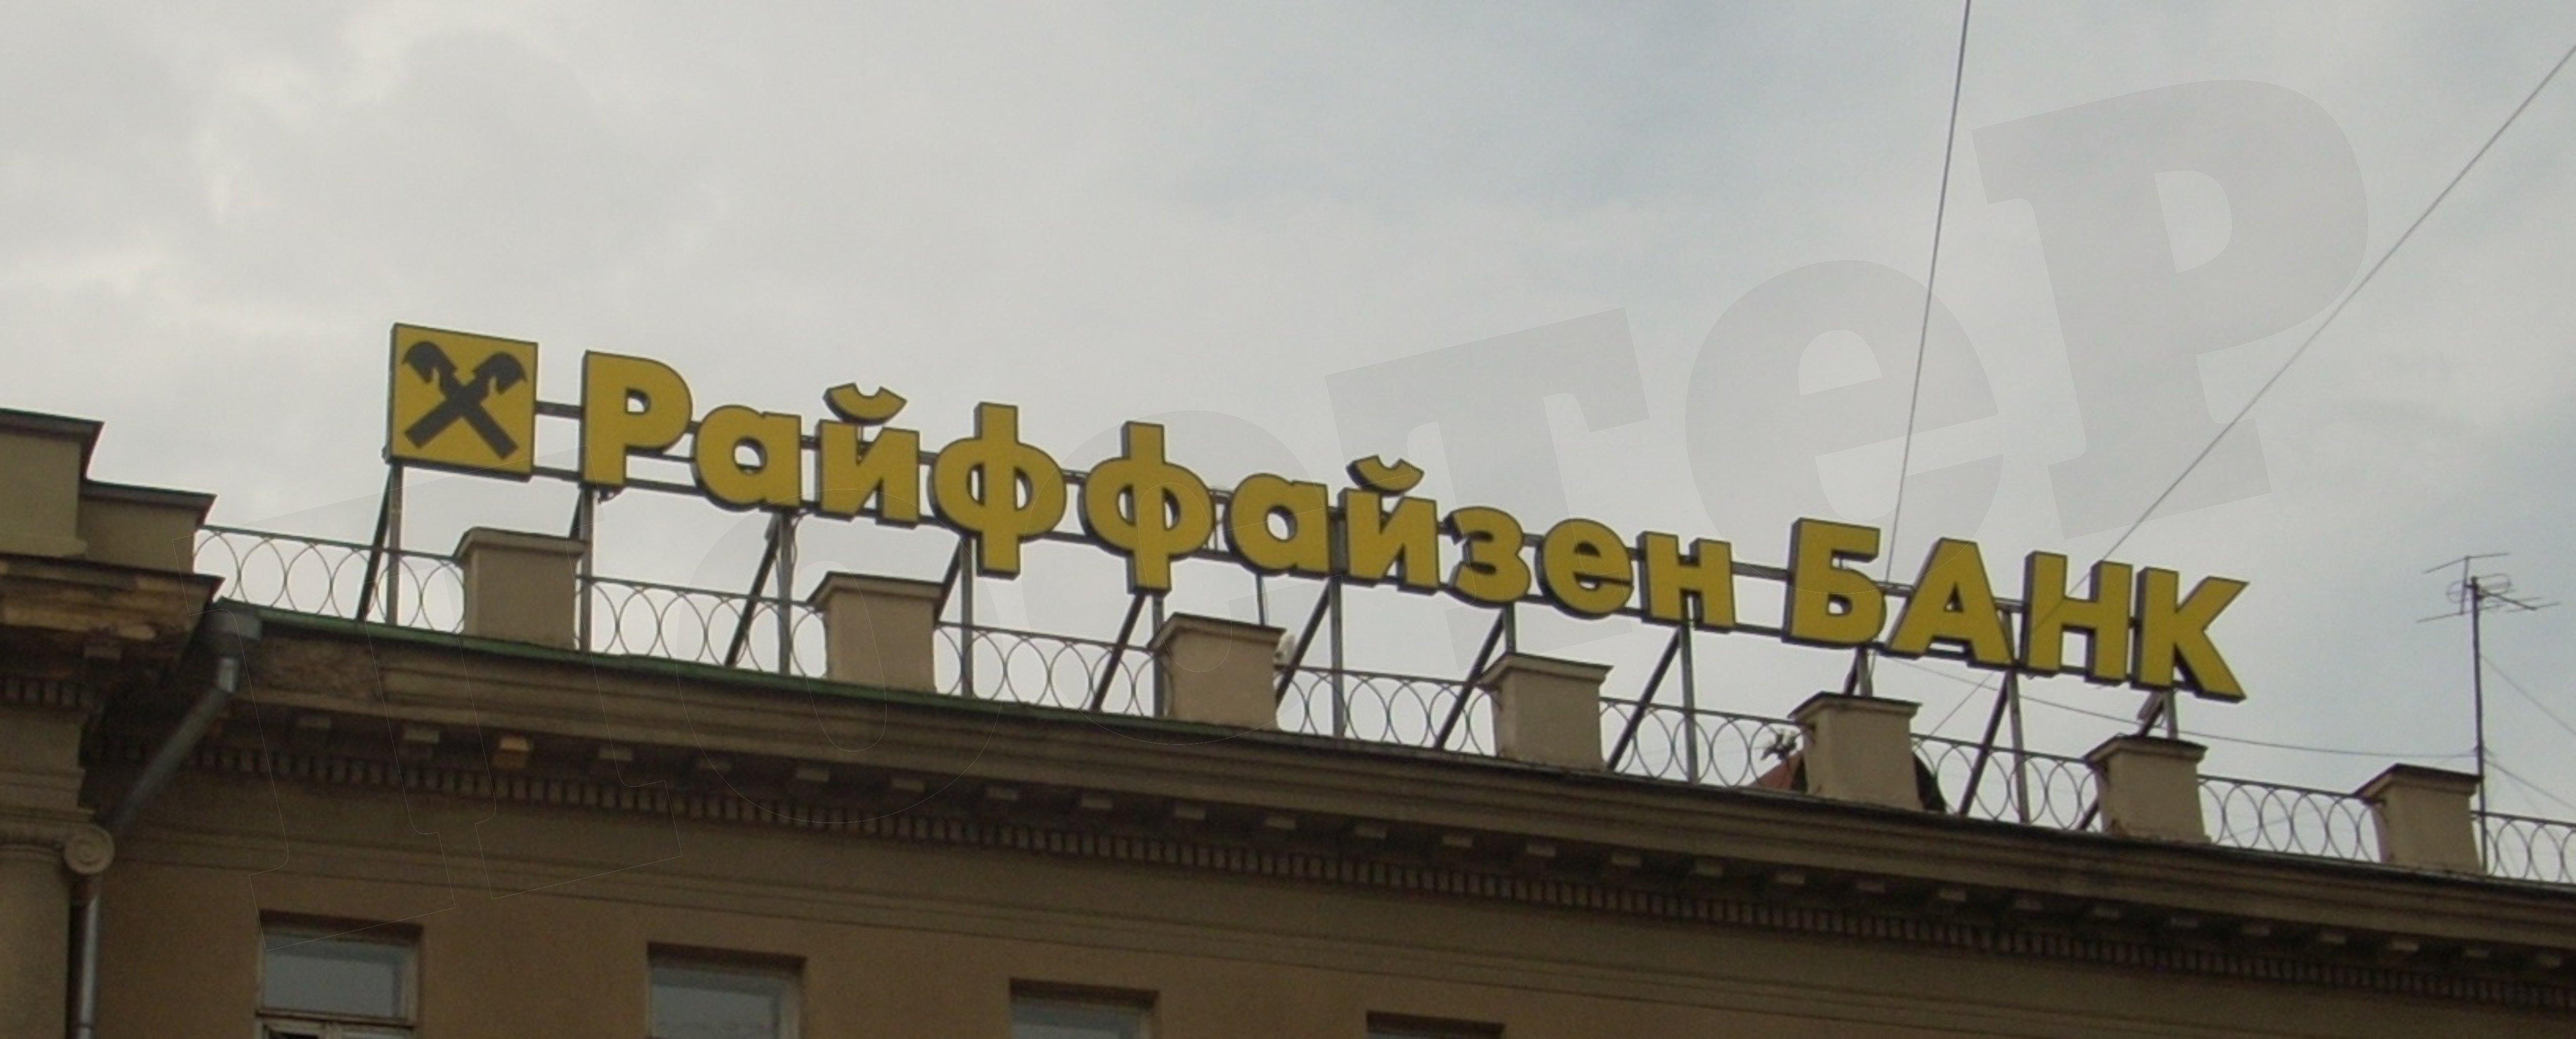 Монтаж объемных букв на крыше здания